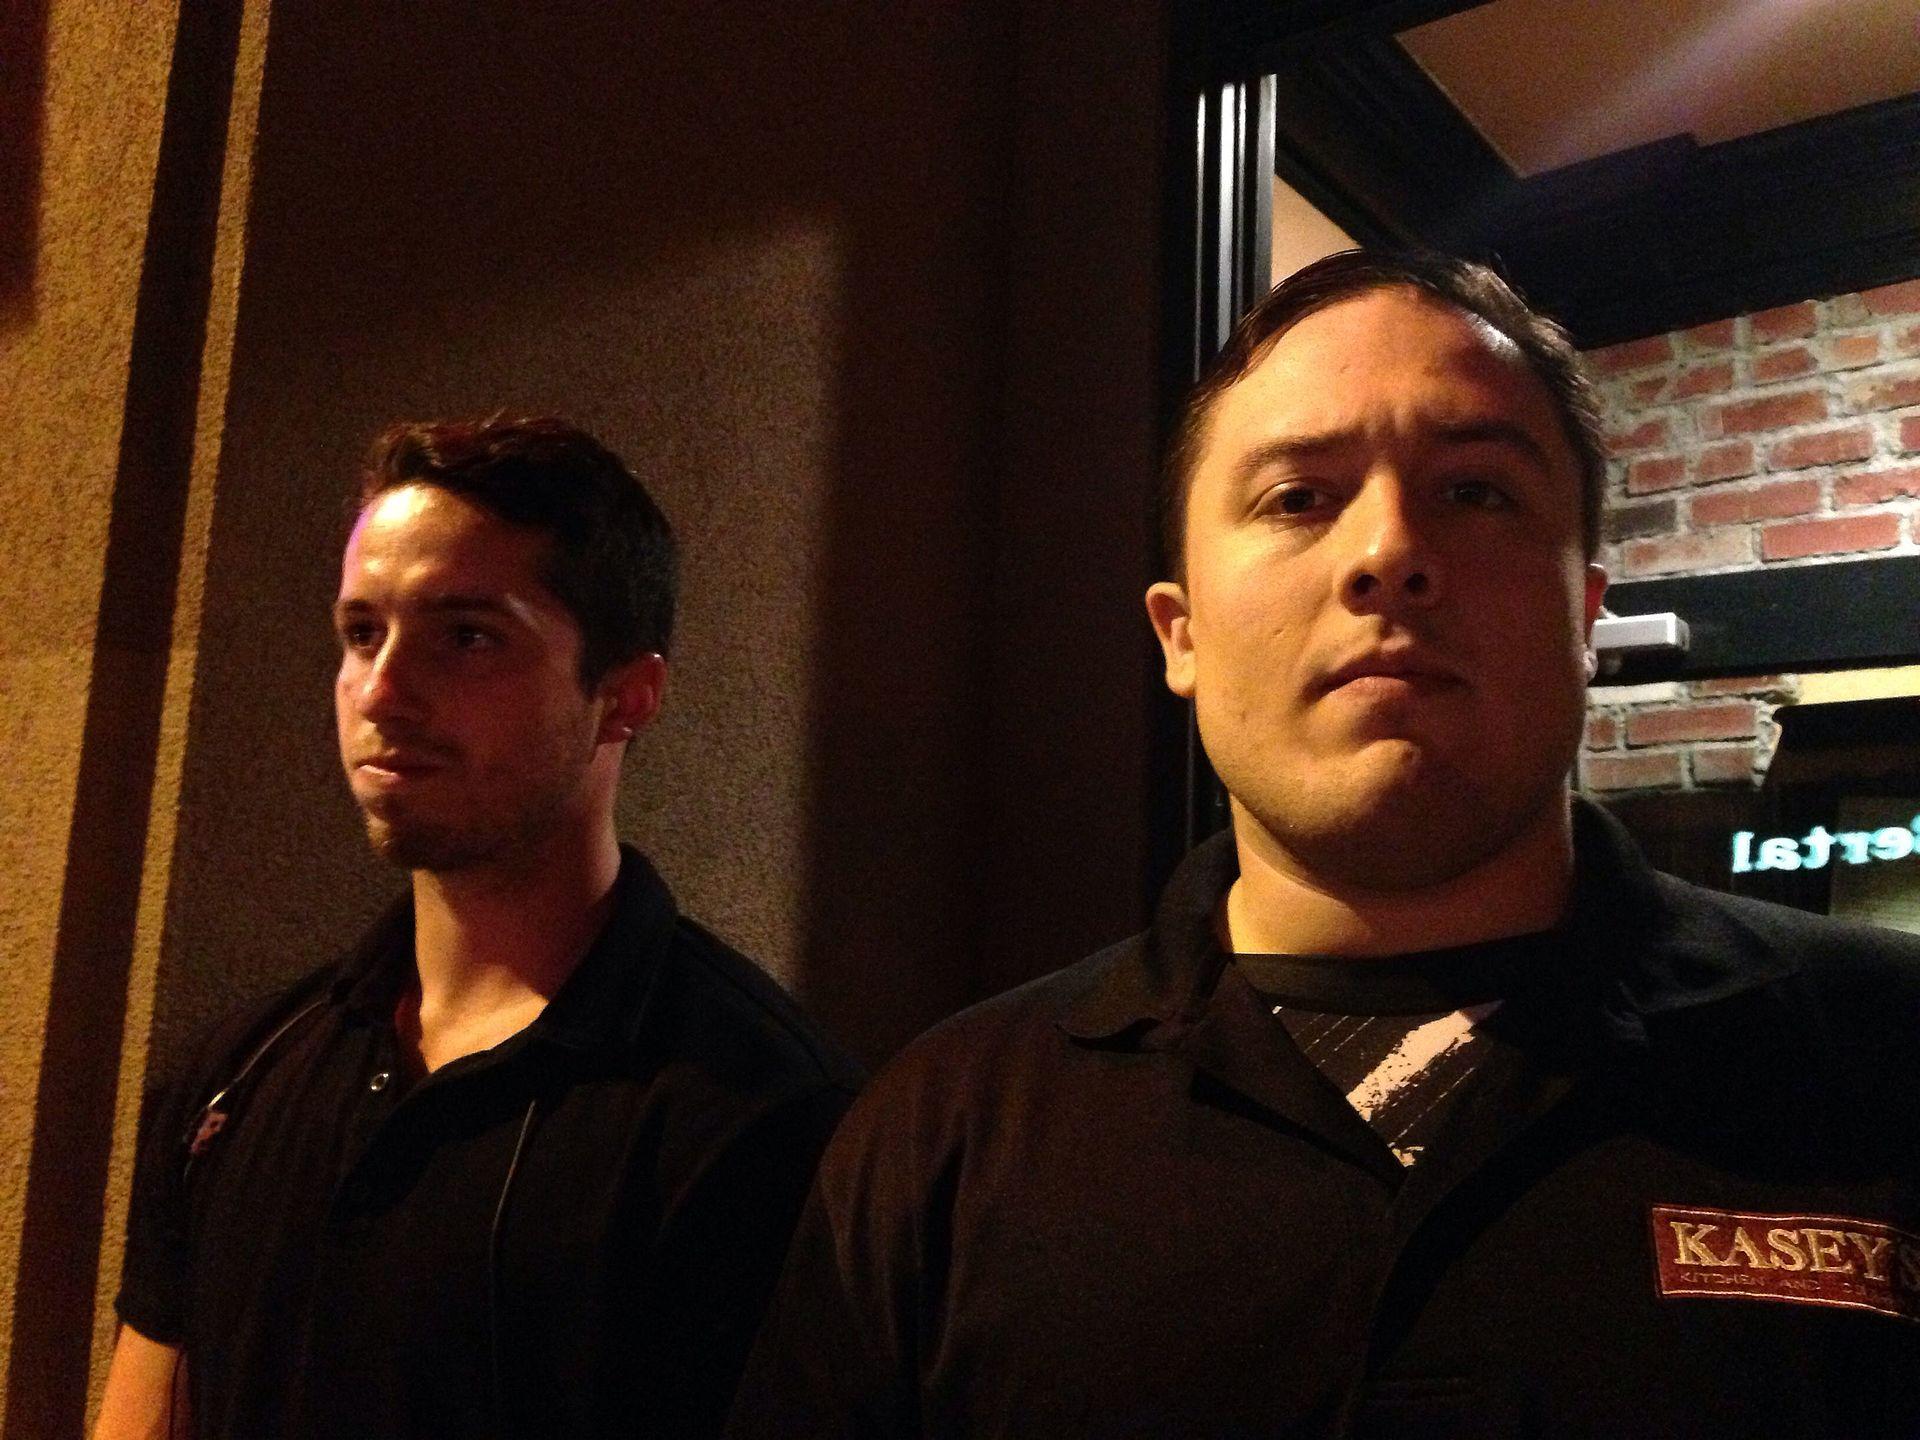 California Security Guard Training